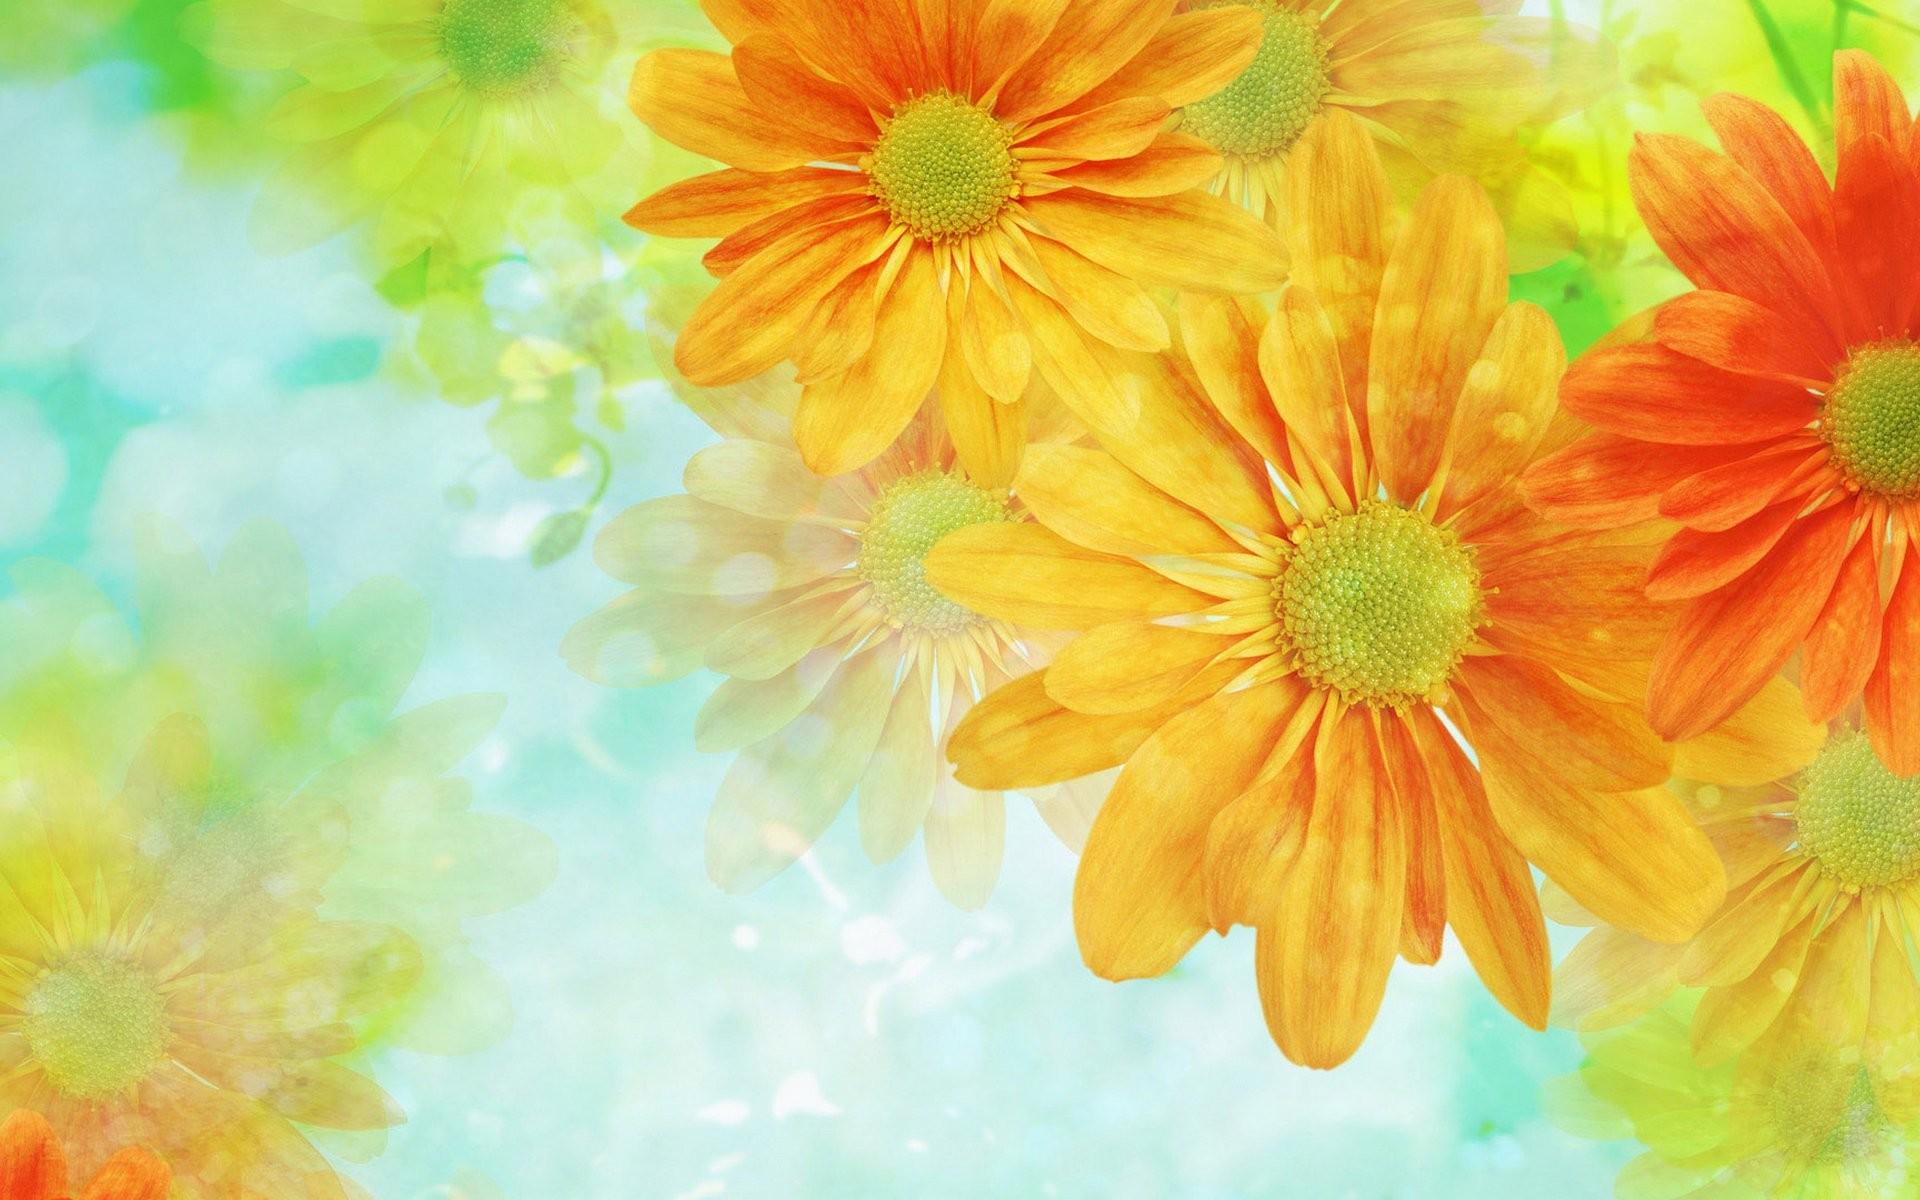 Flower Lock Screen Nature Wallpaper Hd For Mobile